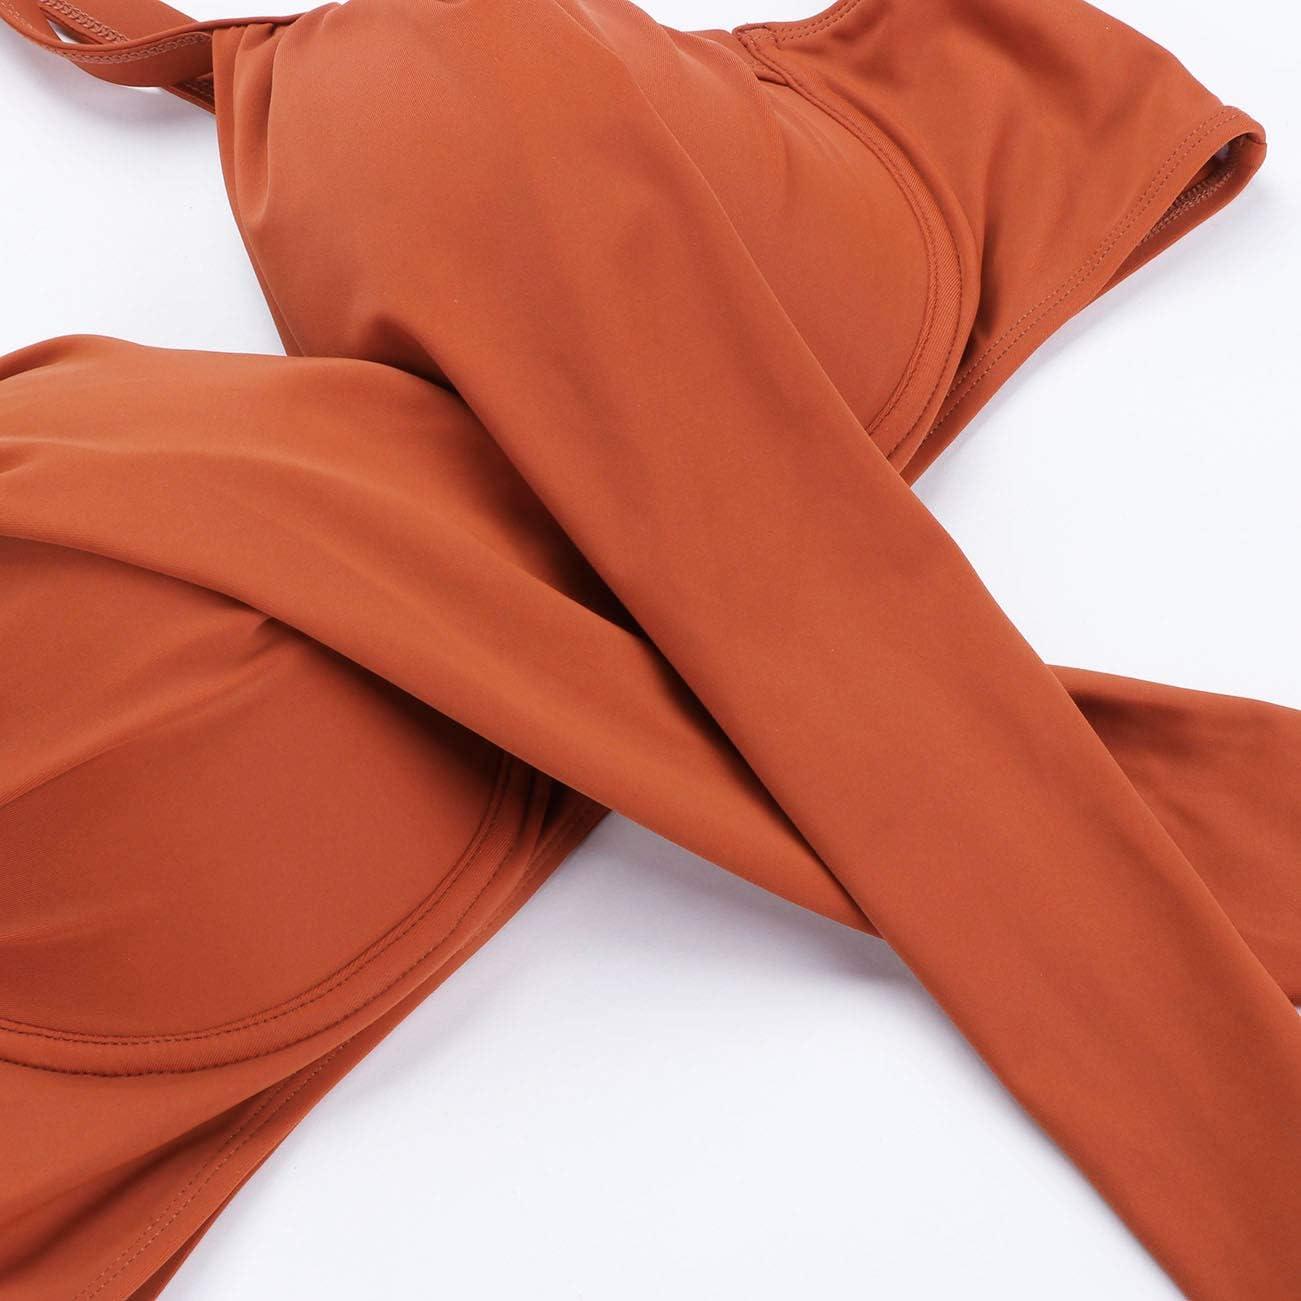 FeelinGirl Bikini Tankini Bademode Badeanzug Monokini Retro Gro/ß Gr/ö/ße Bikini Sets Plus Size Bandeau High Waist Bikini Damen Bauchweg